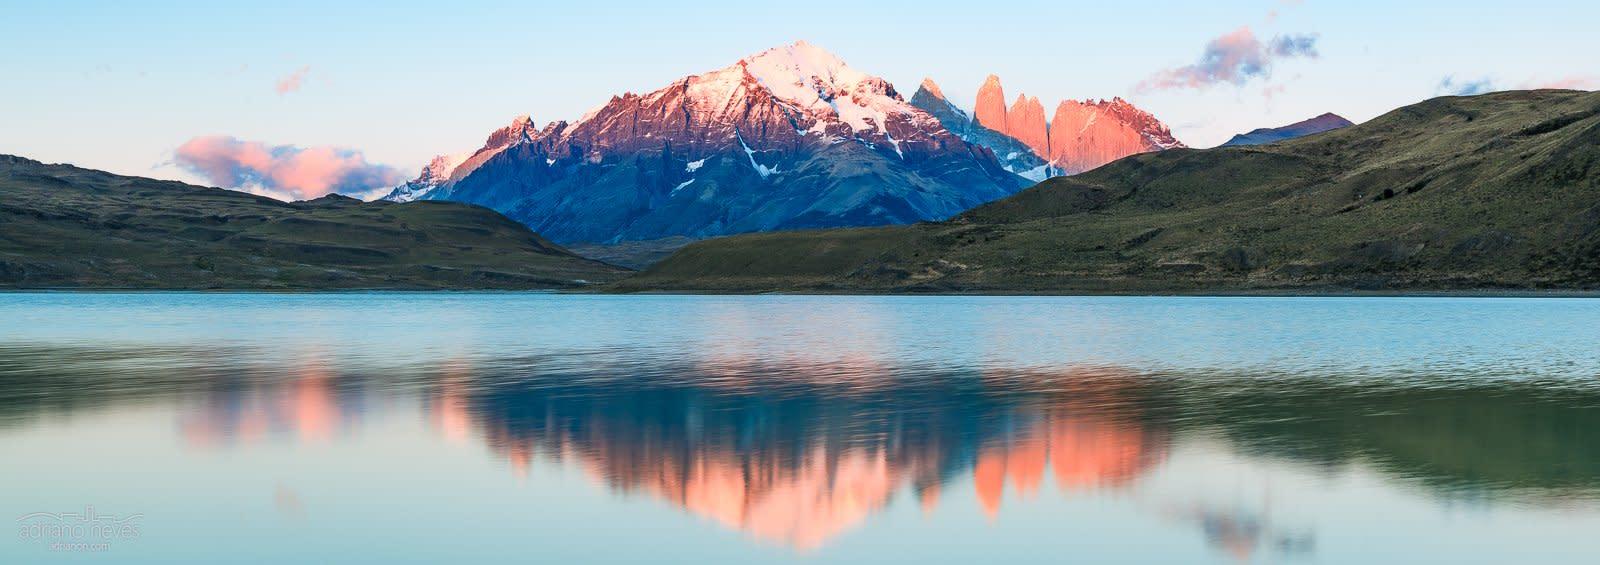 Laguna Amarga I - Chile, Patagonia